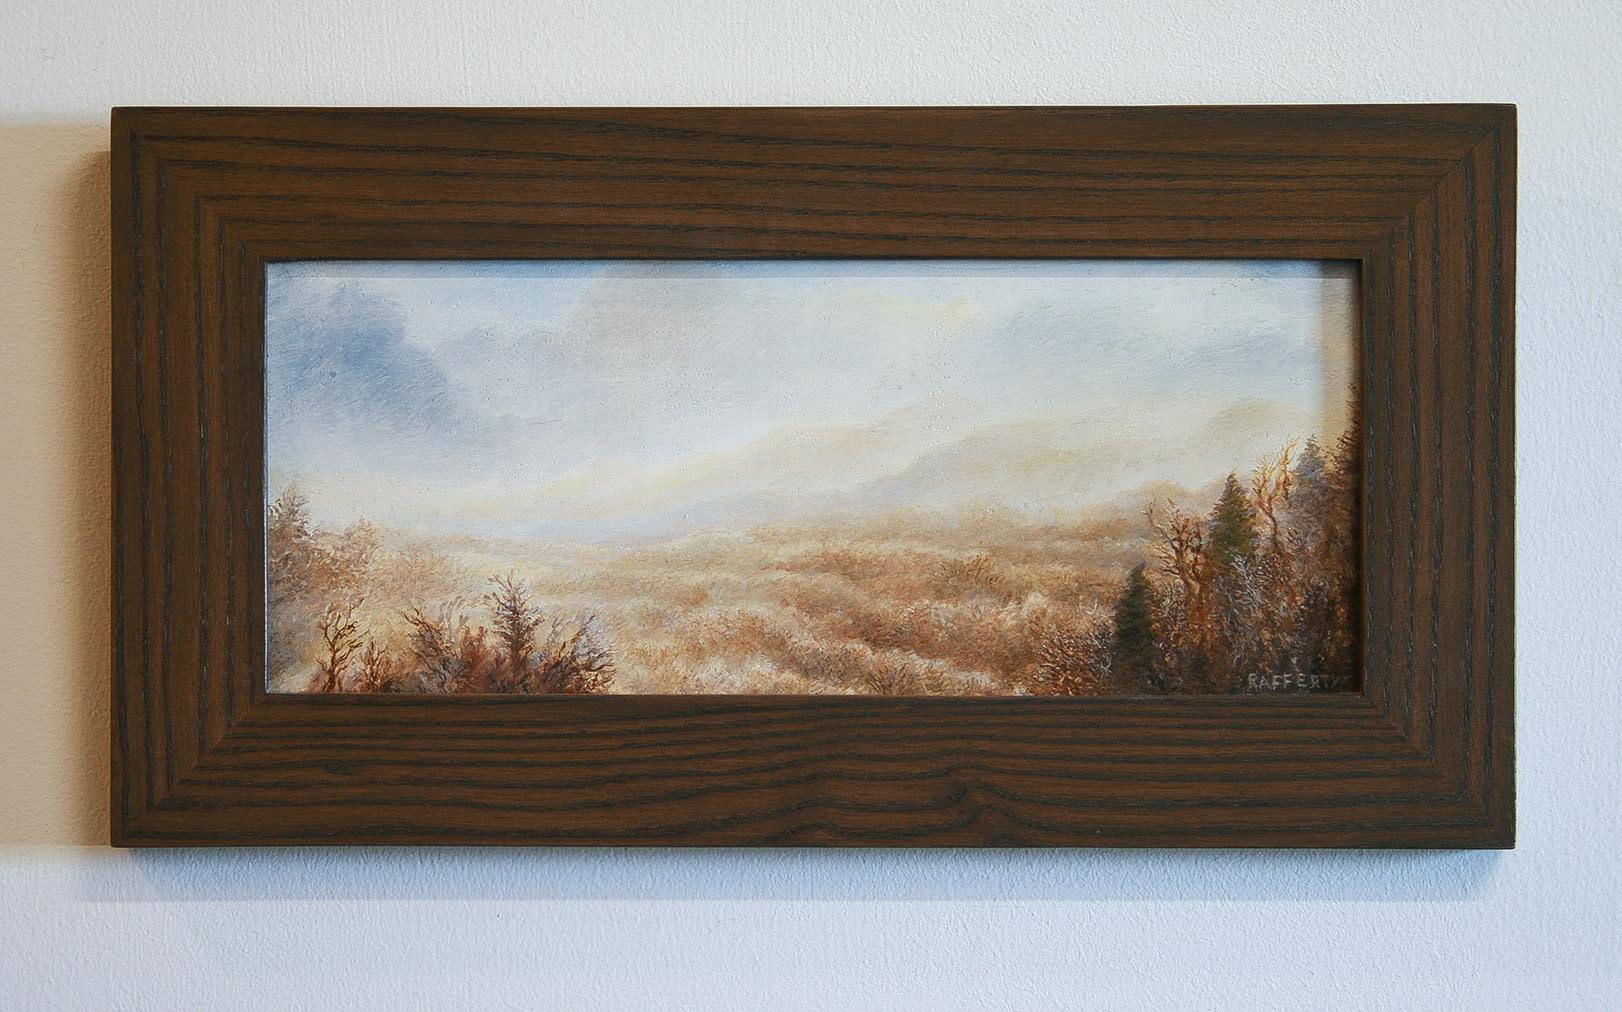 Framed paintings   rafferty2 m dh7env